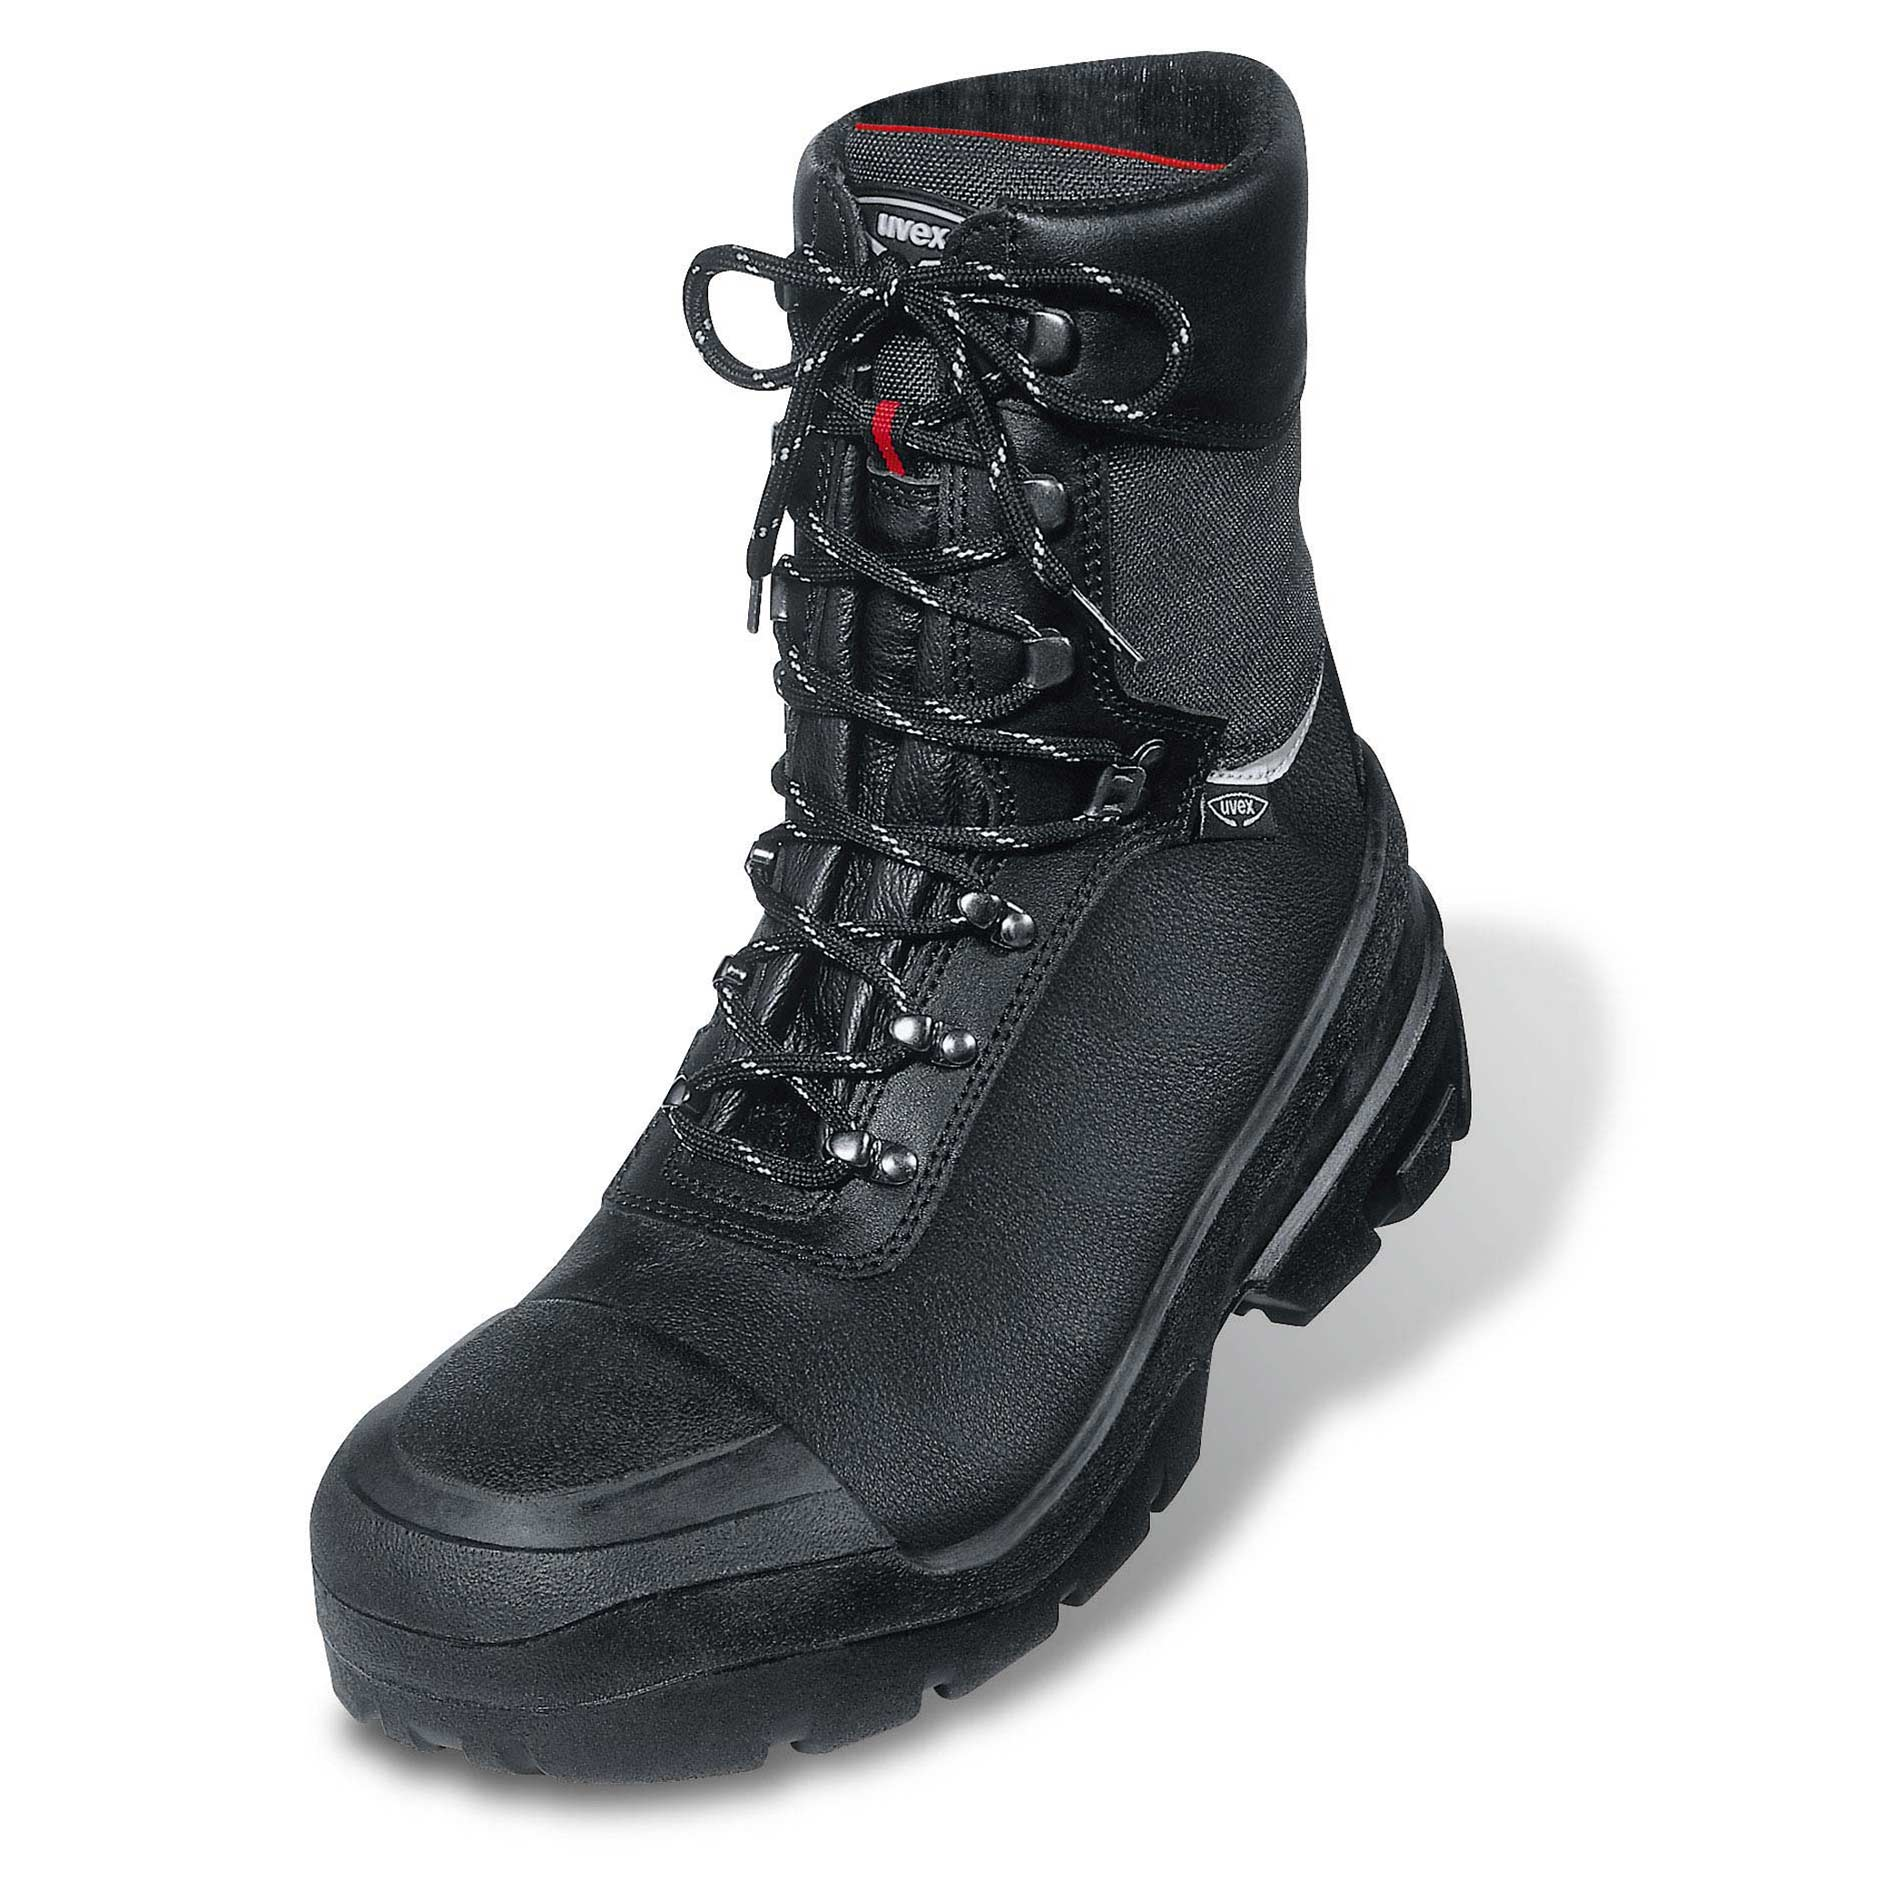 Uvex Quatro Pro S3 Ci Src Winter Lace Up Boot Safety